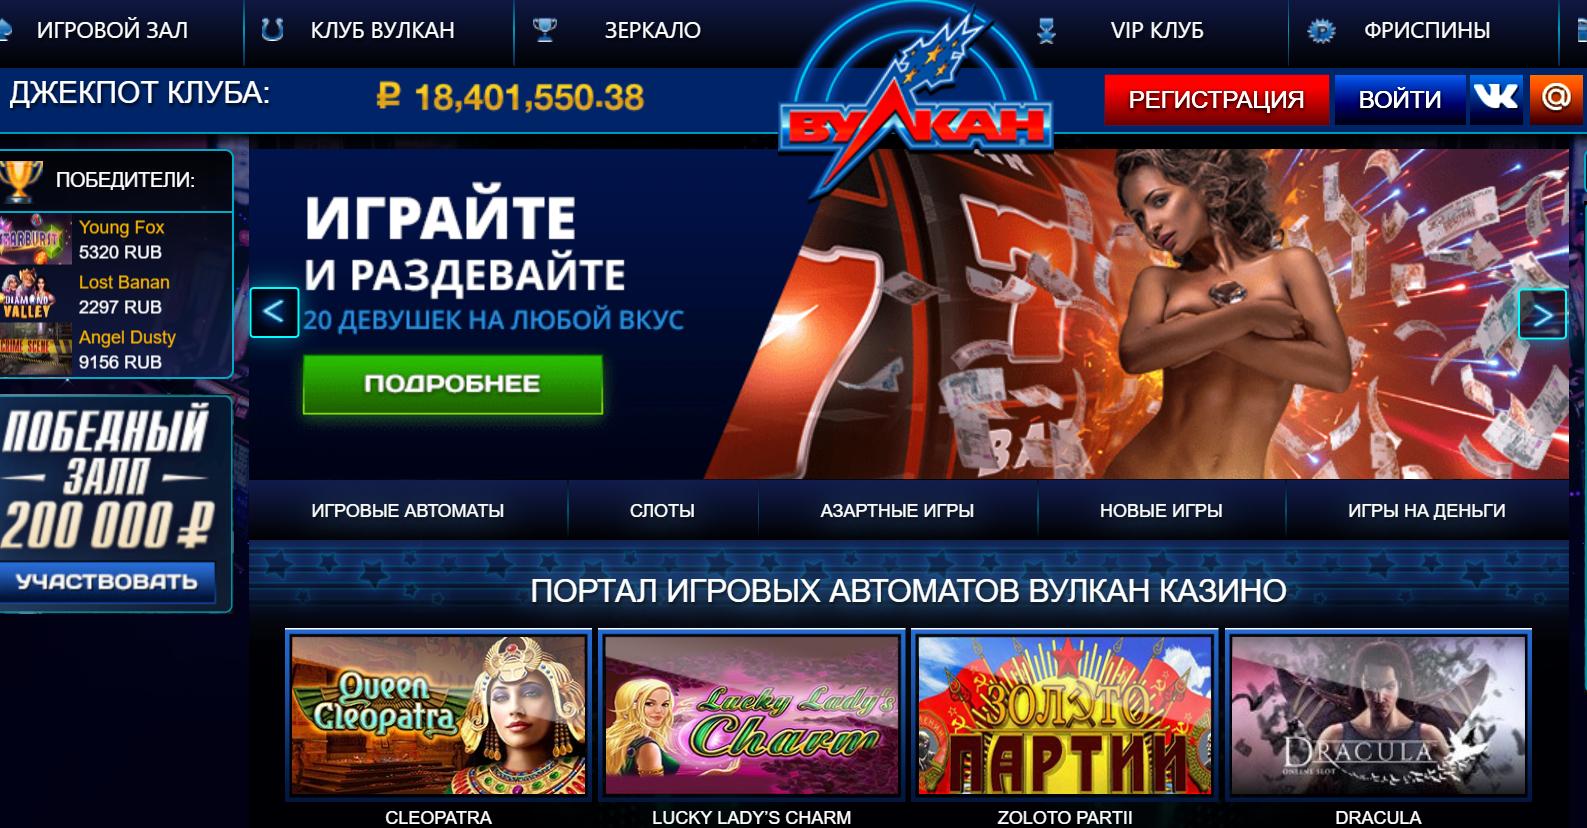 Не грусти – на сайт онлайн-казино Вулкан  заходи